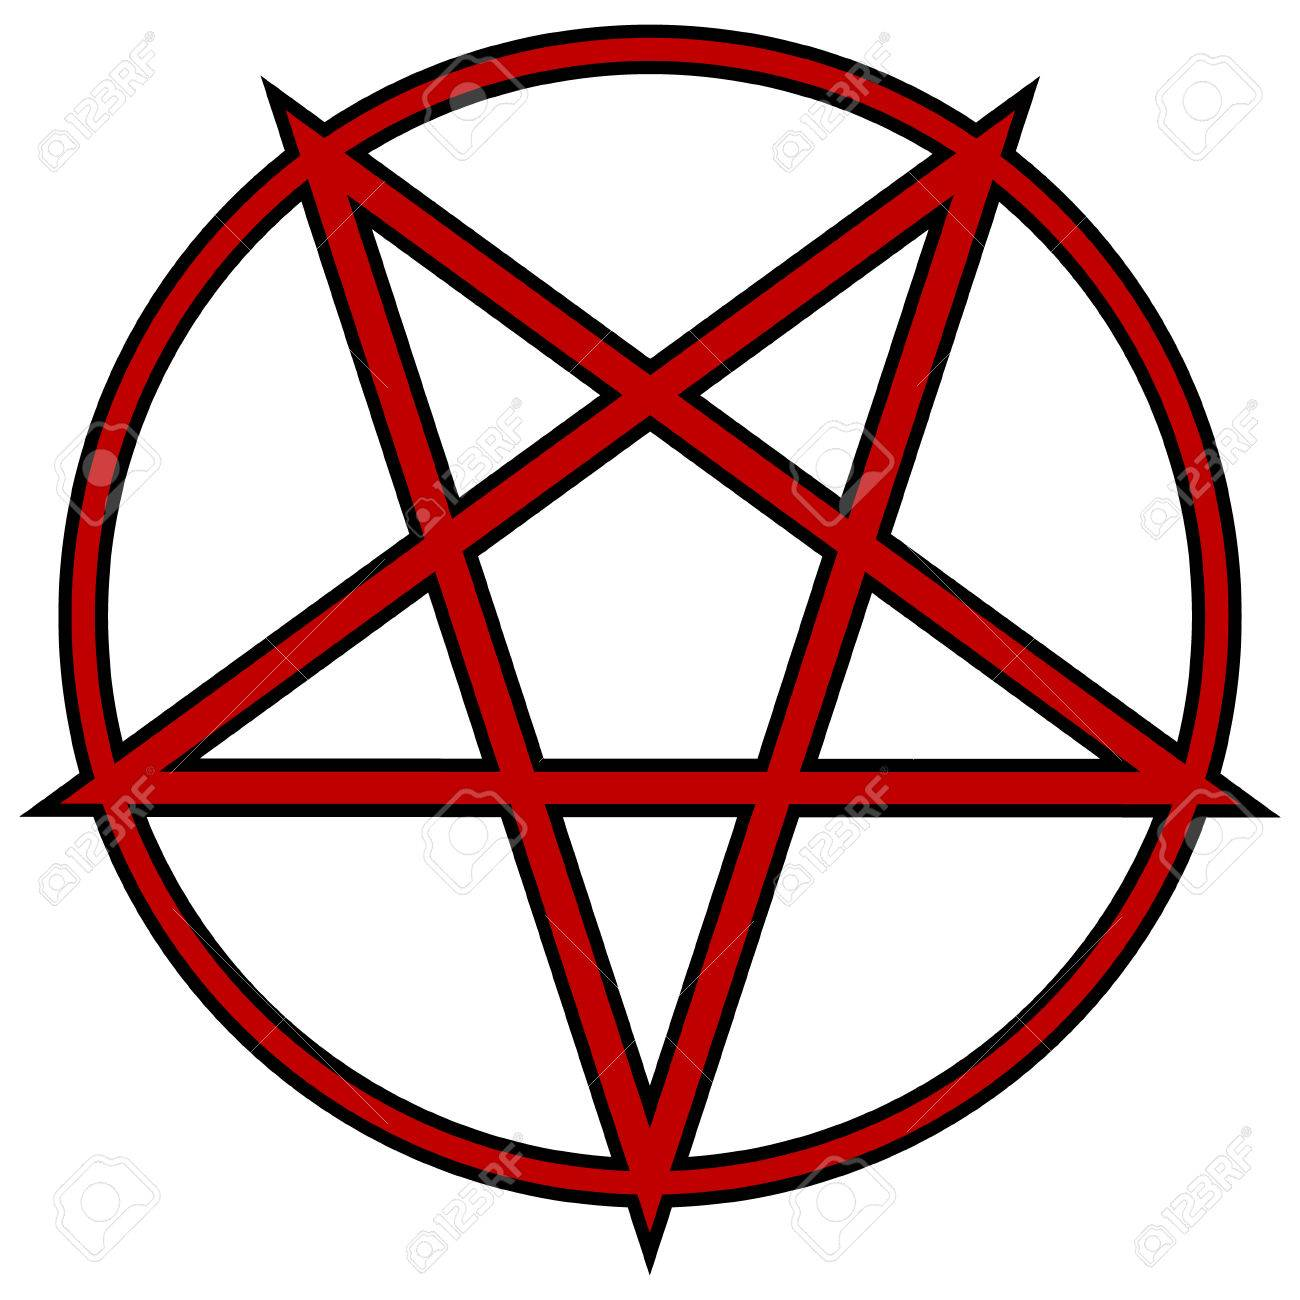 pentagram icon on white background vector illustration royalty rh 123rf com pentagram vector free download pentagram vector file